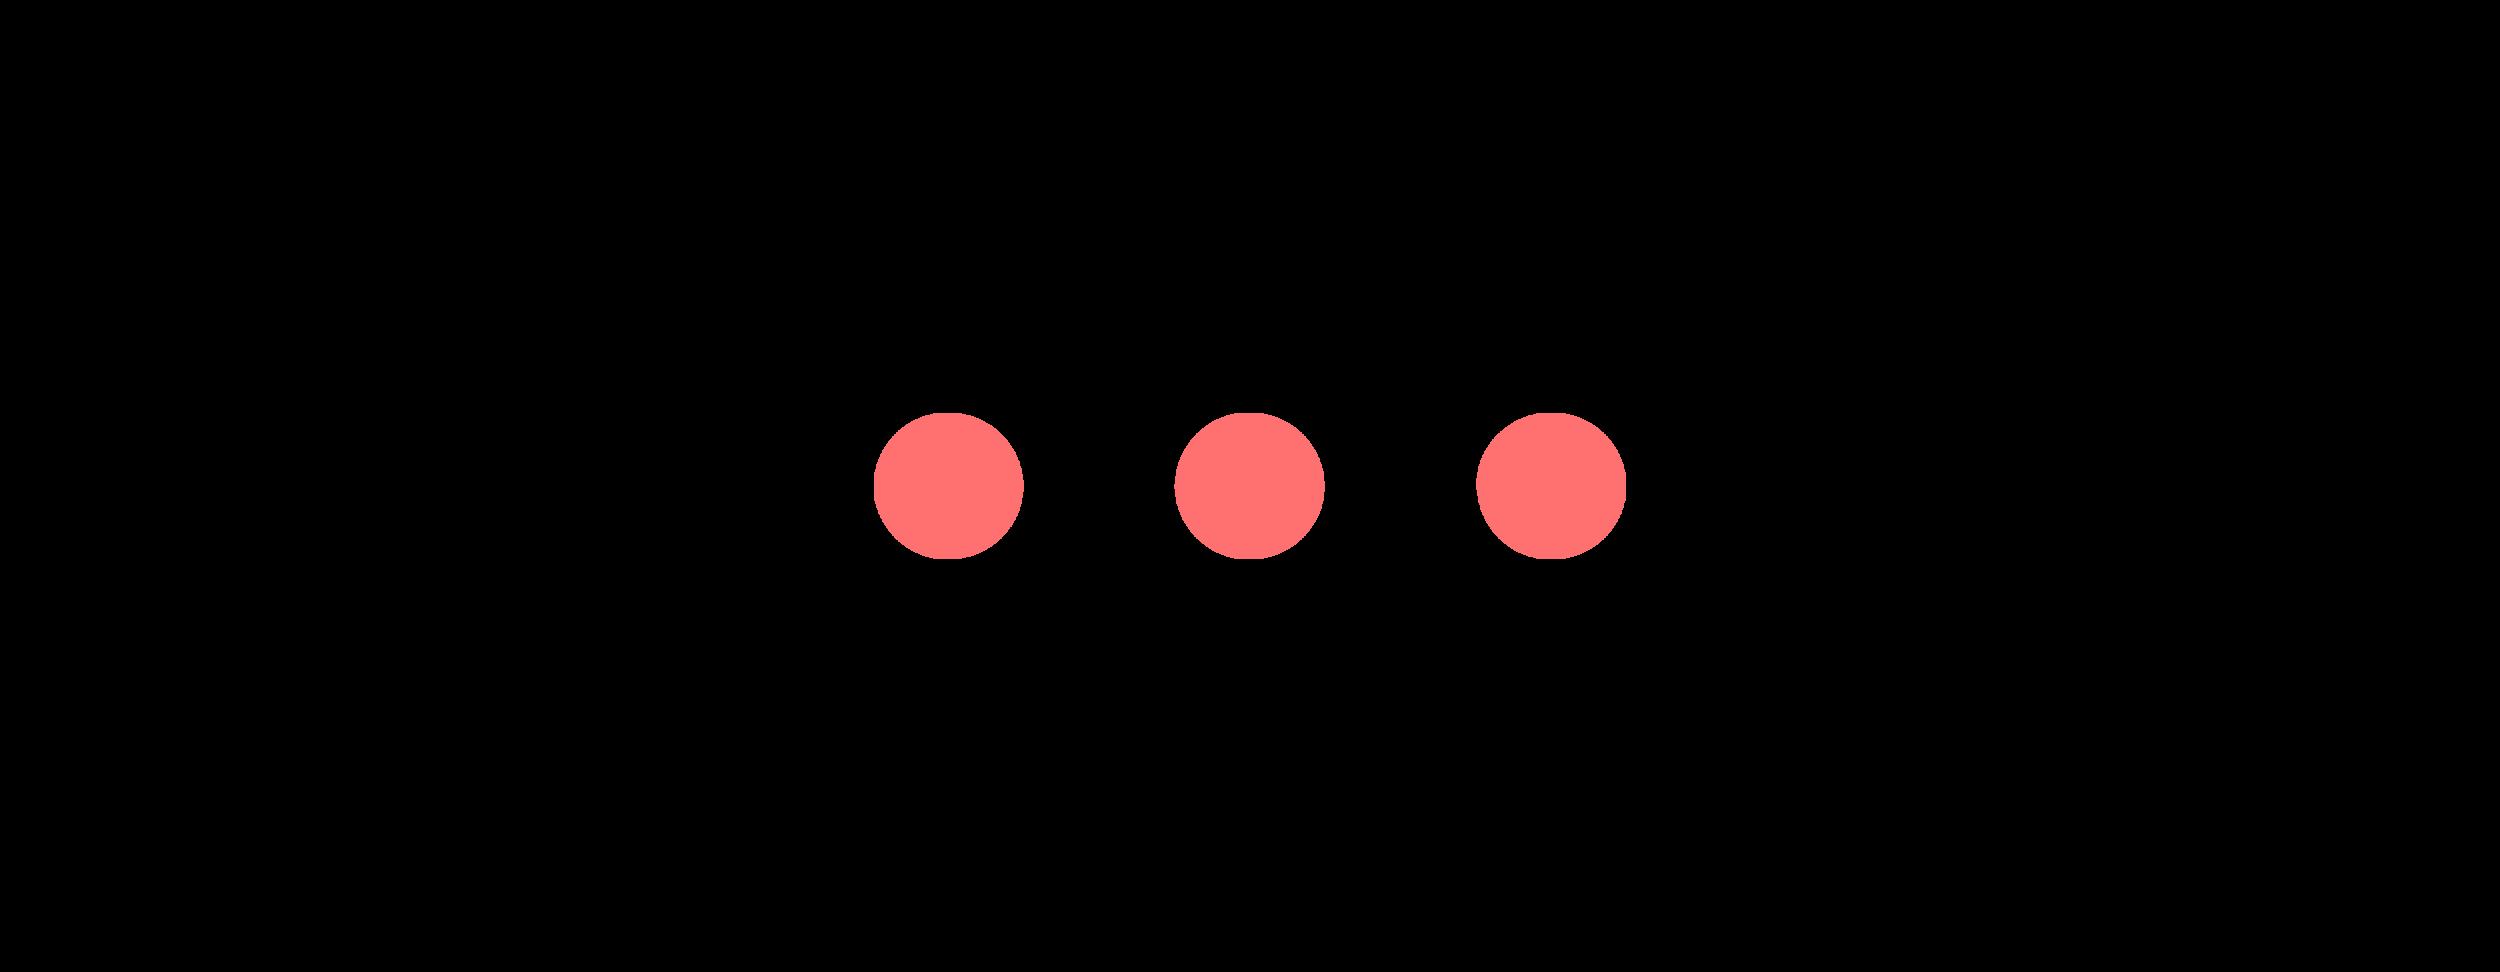 dot dot dot.png